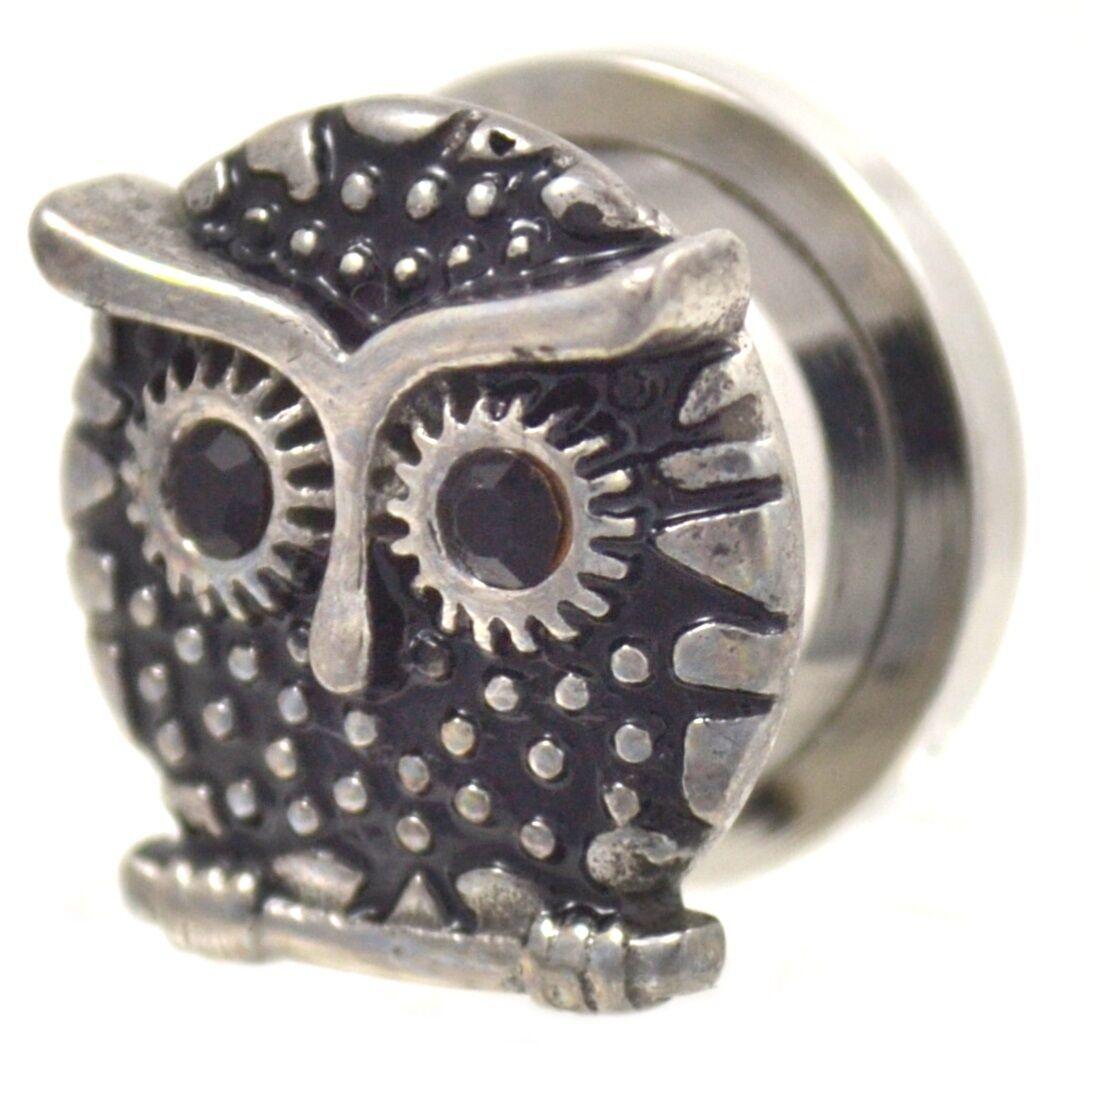 Pierced Owl Stainless Steel Bezel Set Clear Gem Screw Fit Plug Gauges Sold As Pair